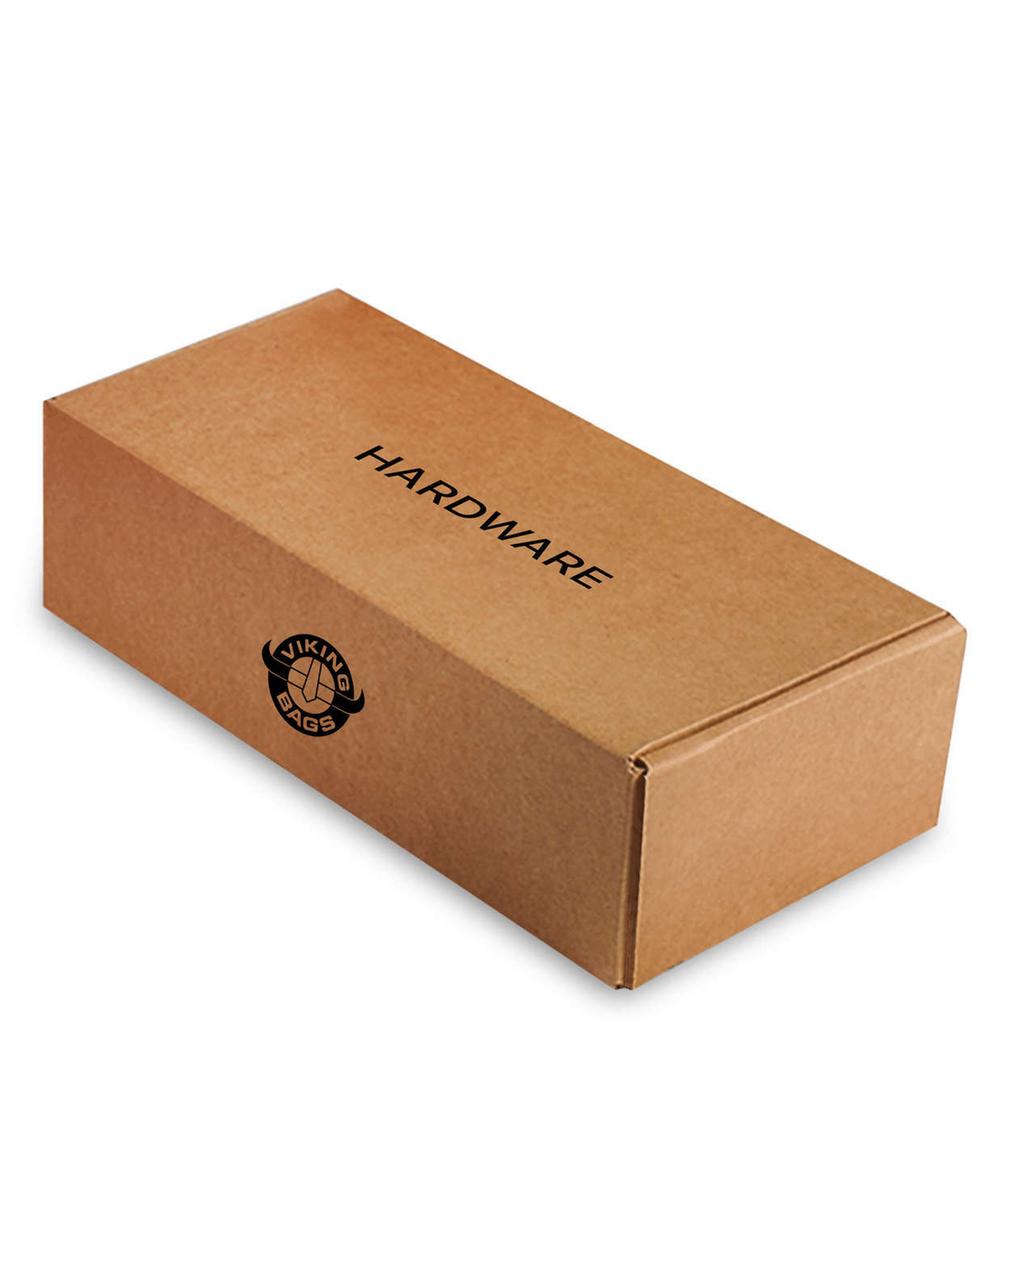 Honda 750 Shadow Phantom Medium Warrior Slanted Motorcycle Saddlebags box